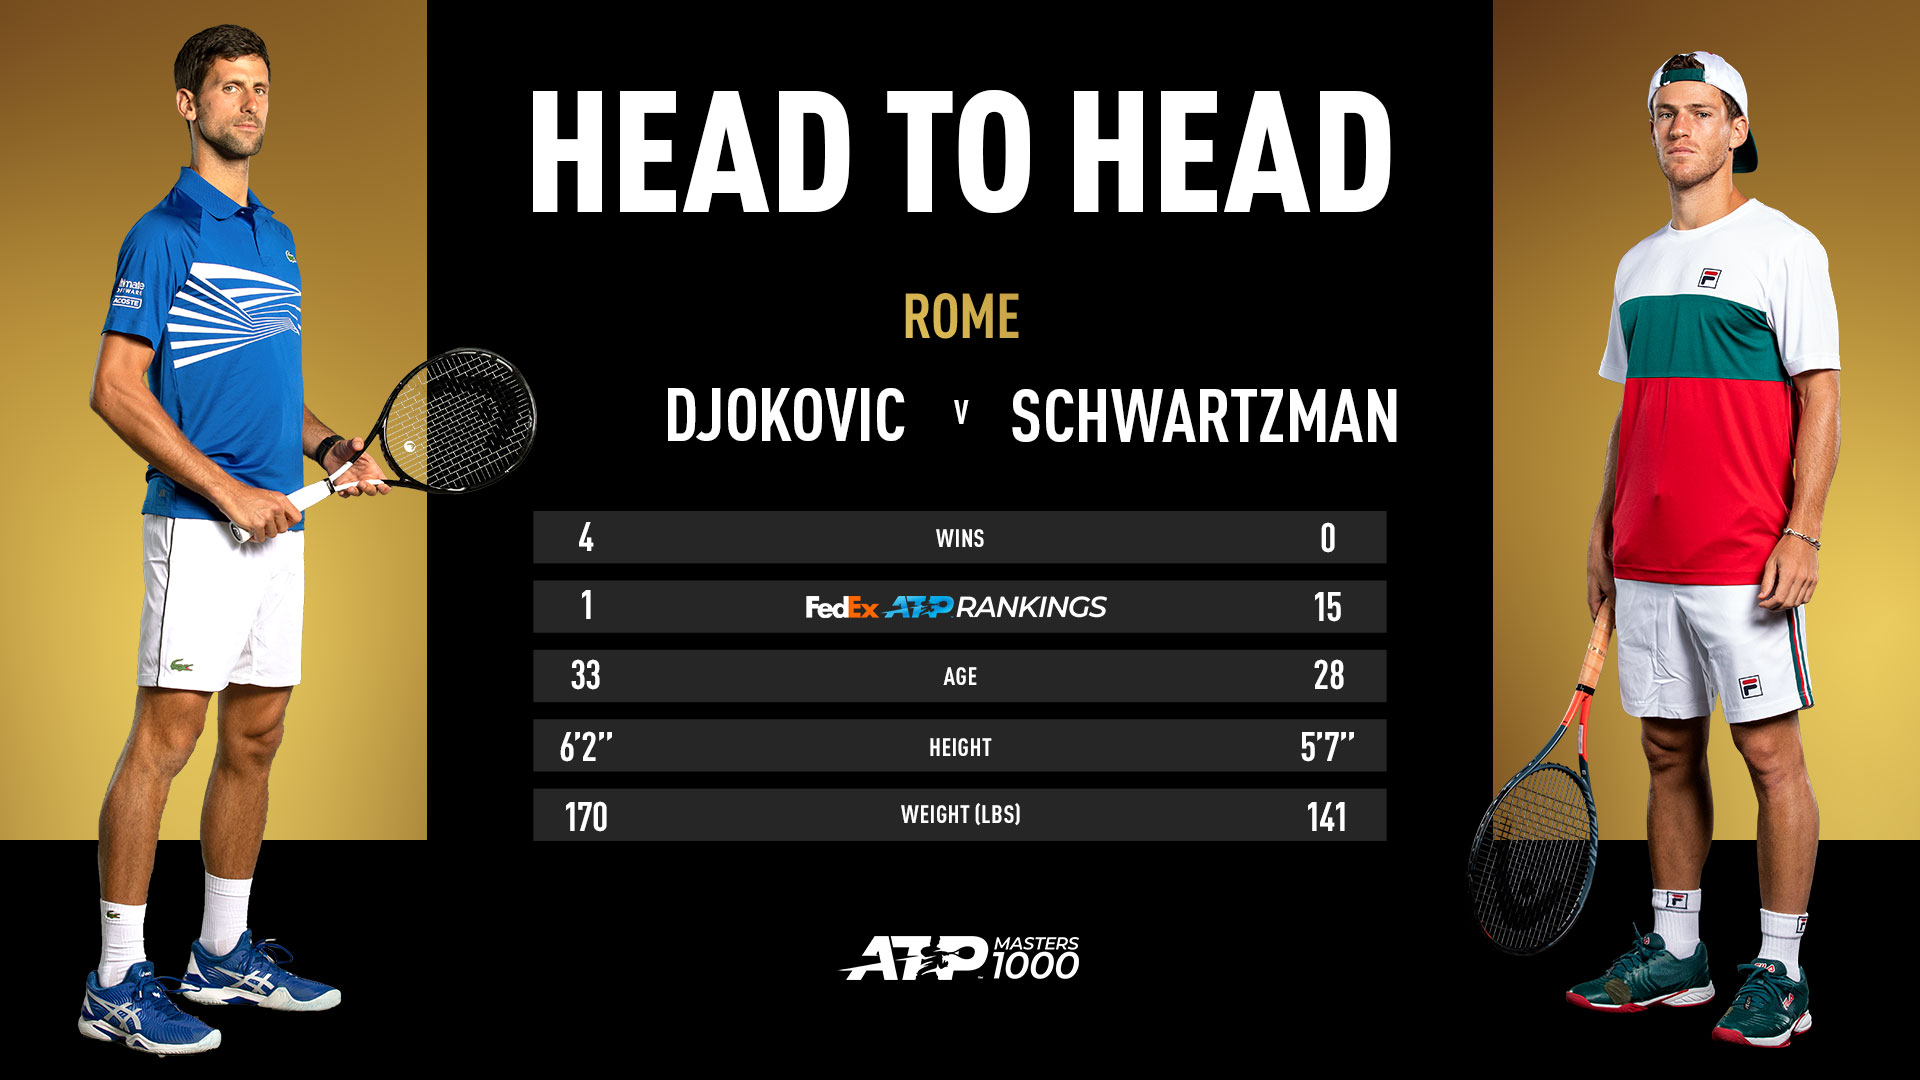 Final Preview Novak Djokovic Diego Schwartzman Chase Career Milestones In Rome Atp Tour Tennis